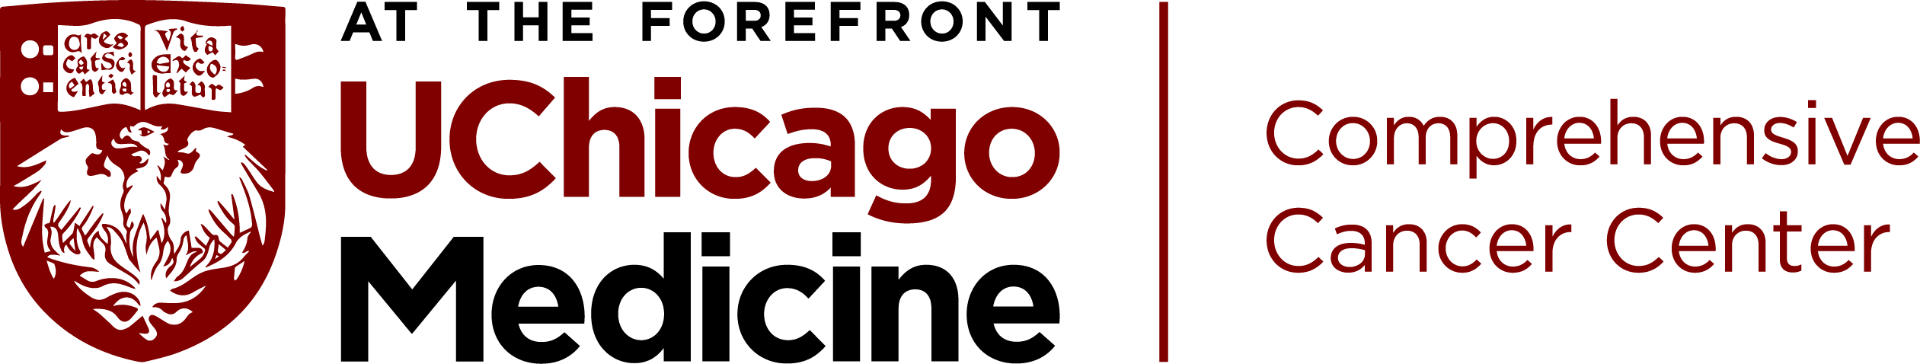 University of Chicago Cancer Center Logo